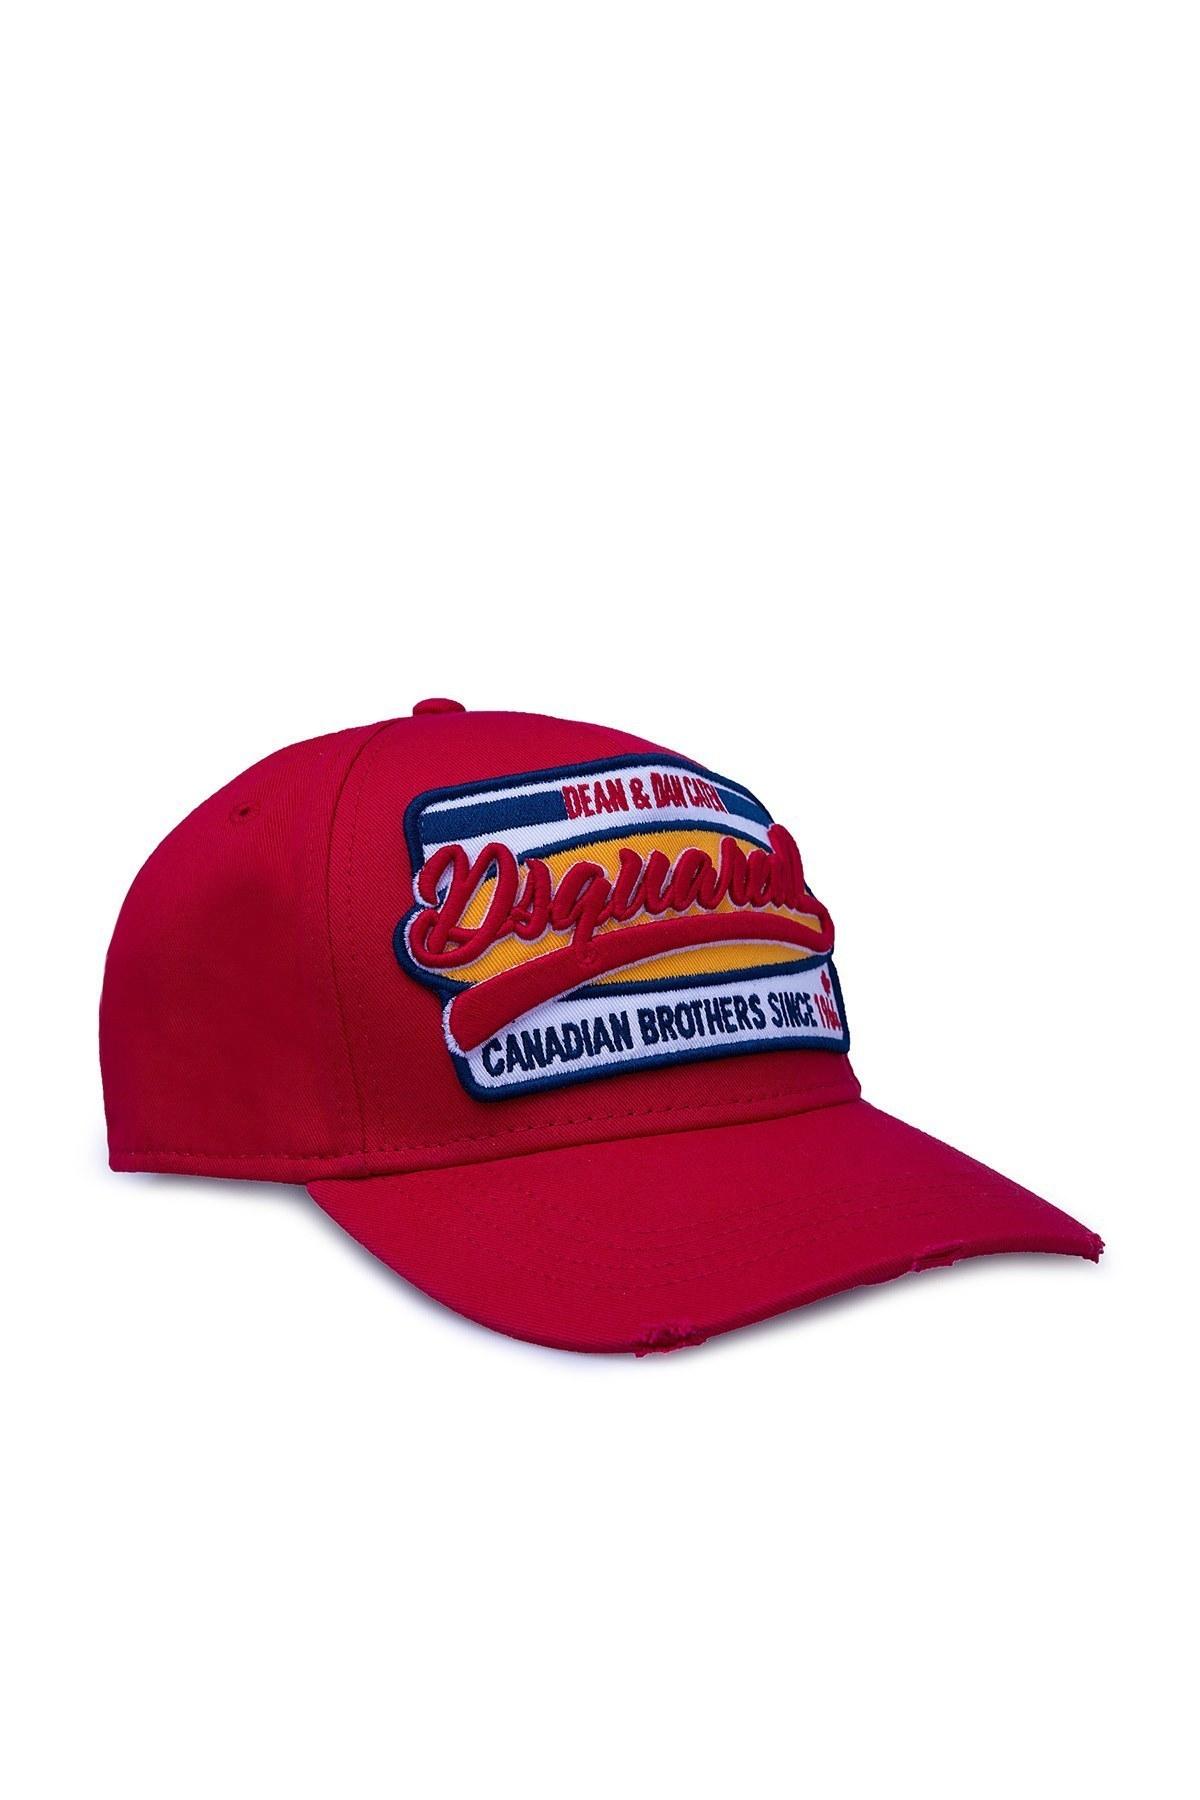 Dsquared2 Erkek Şapka BCM0198 05C00001 4065 KIRMIZI